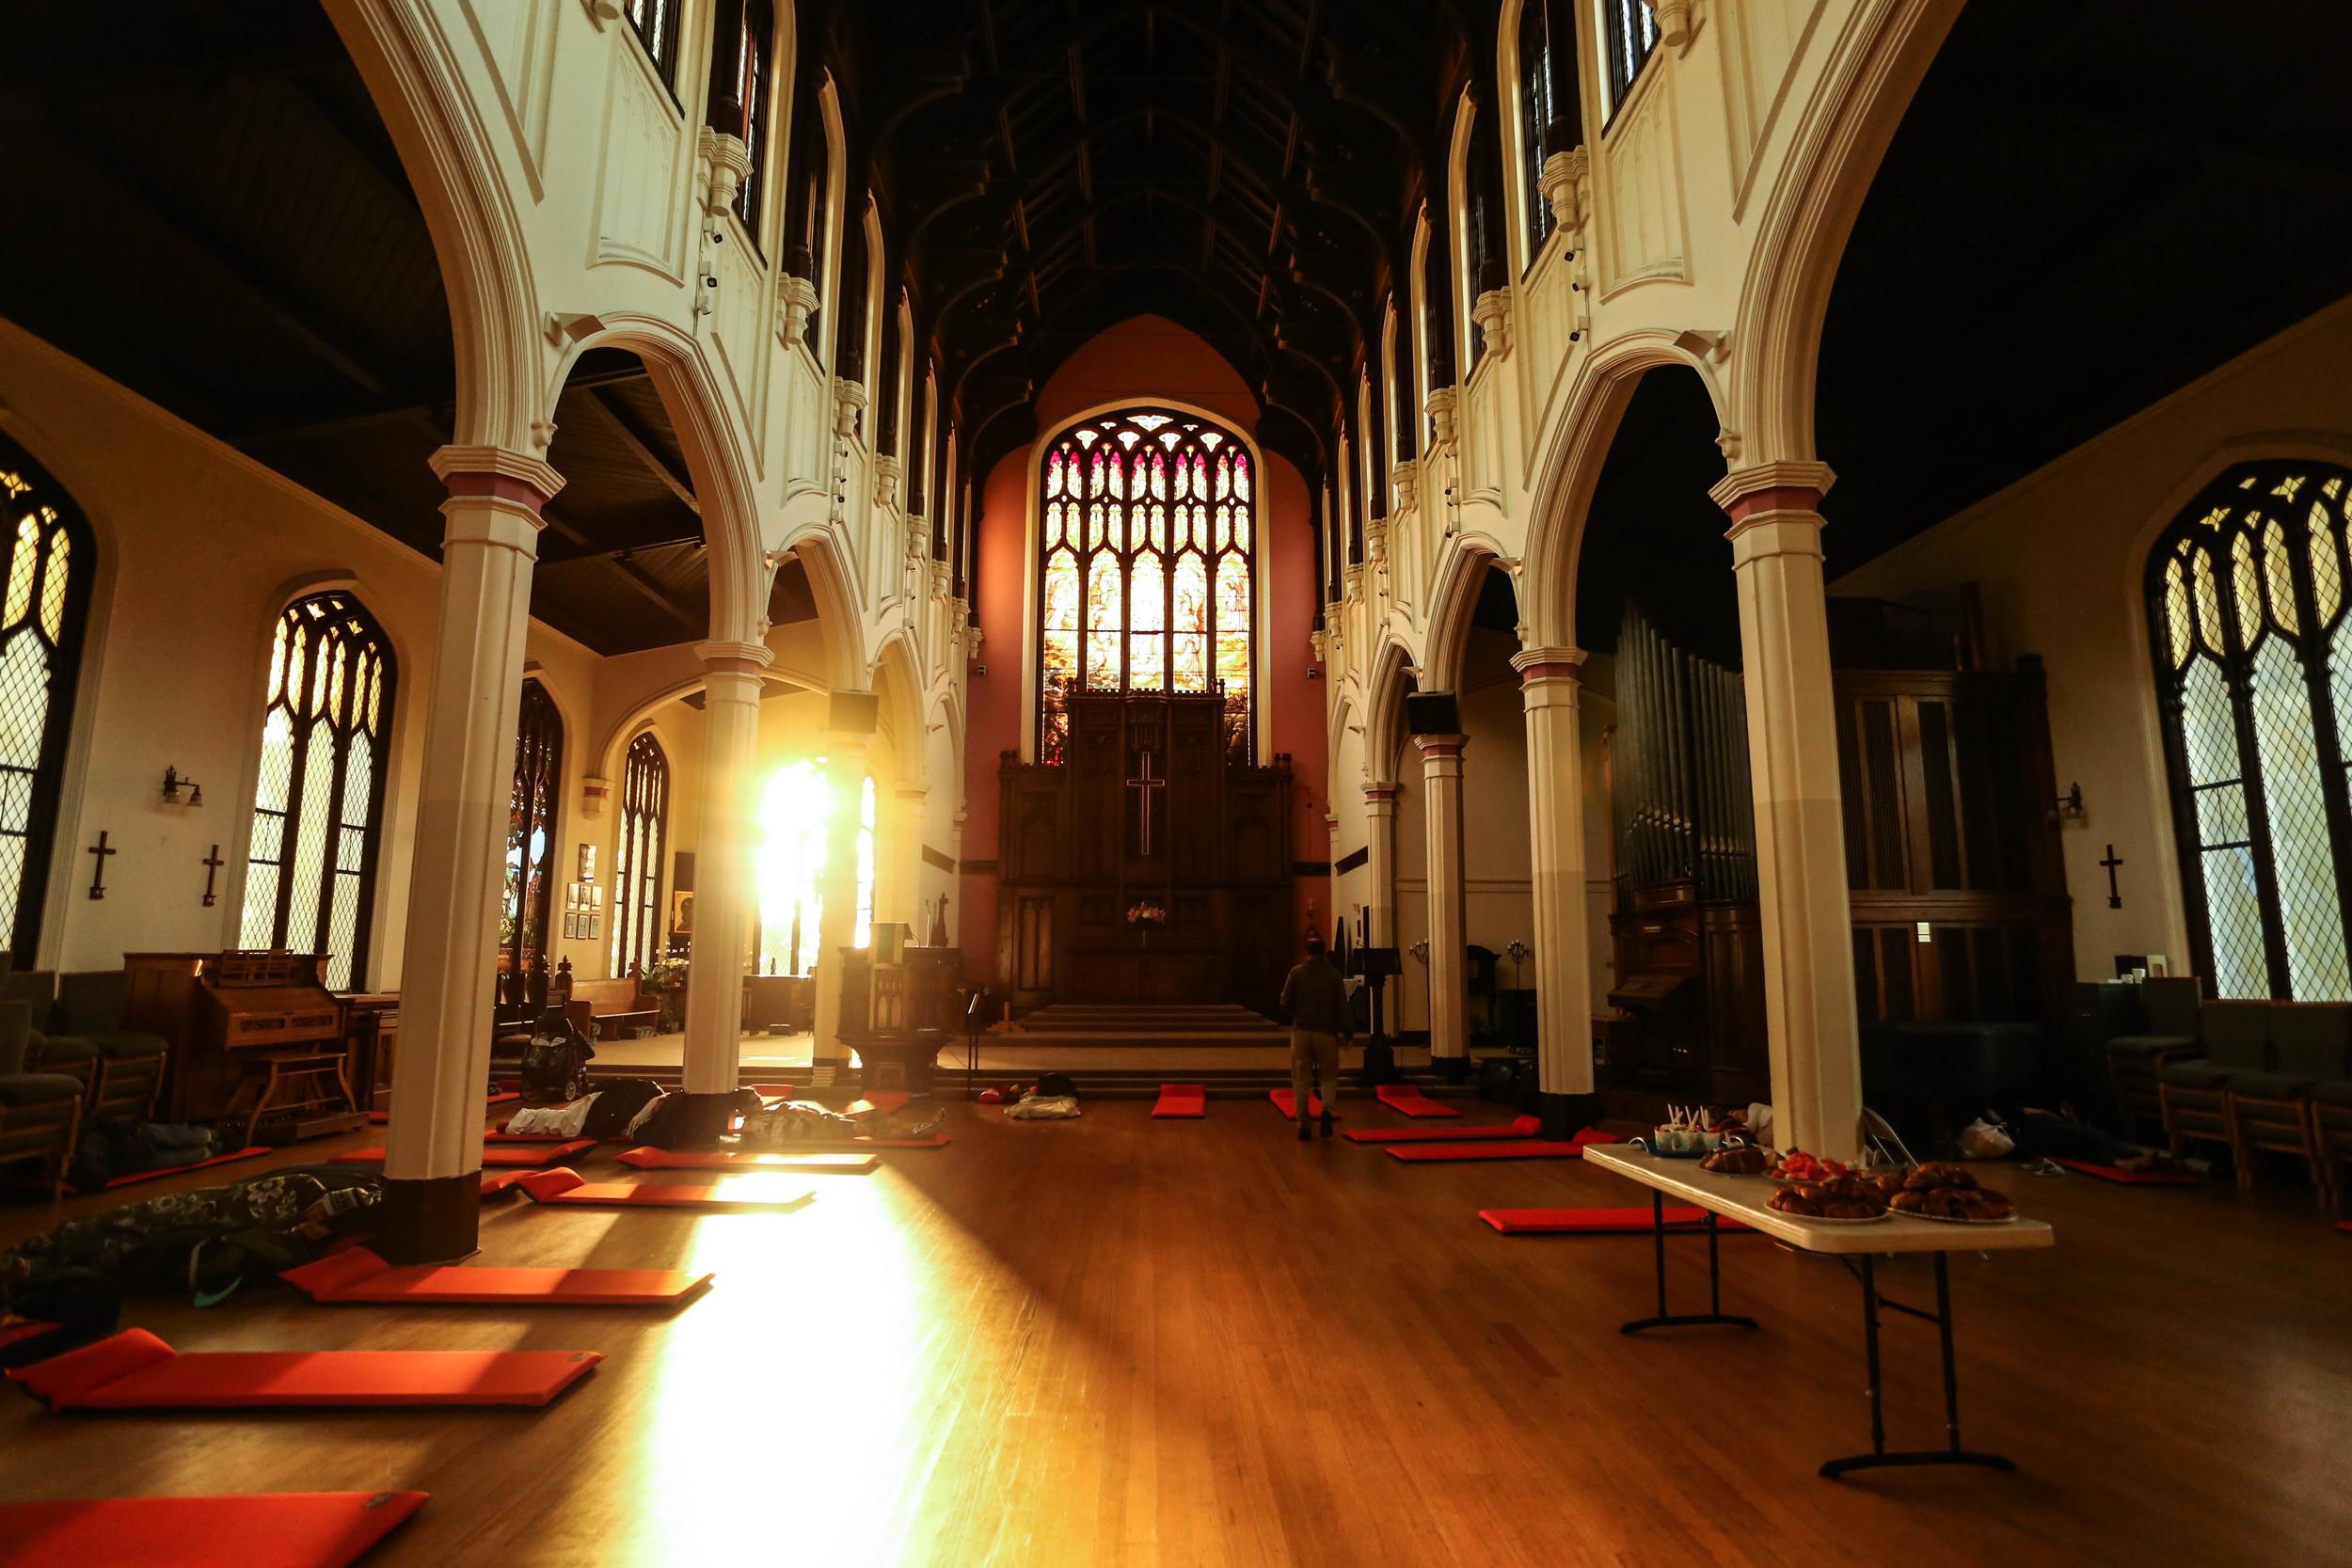 Orange mats line the floor at the Gubbio Project held in St. John the Evangelist Episcopal Church.